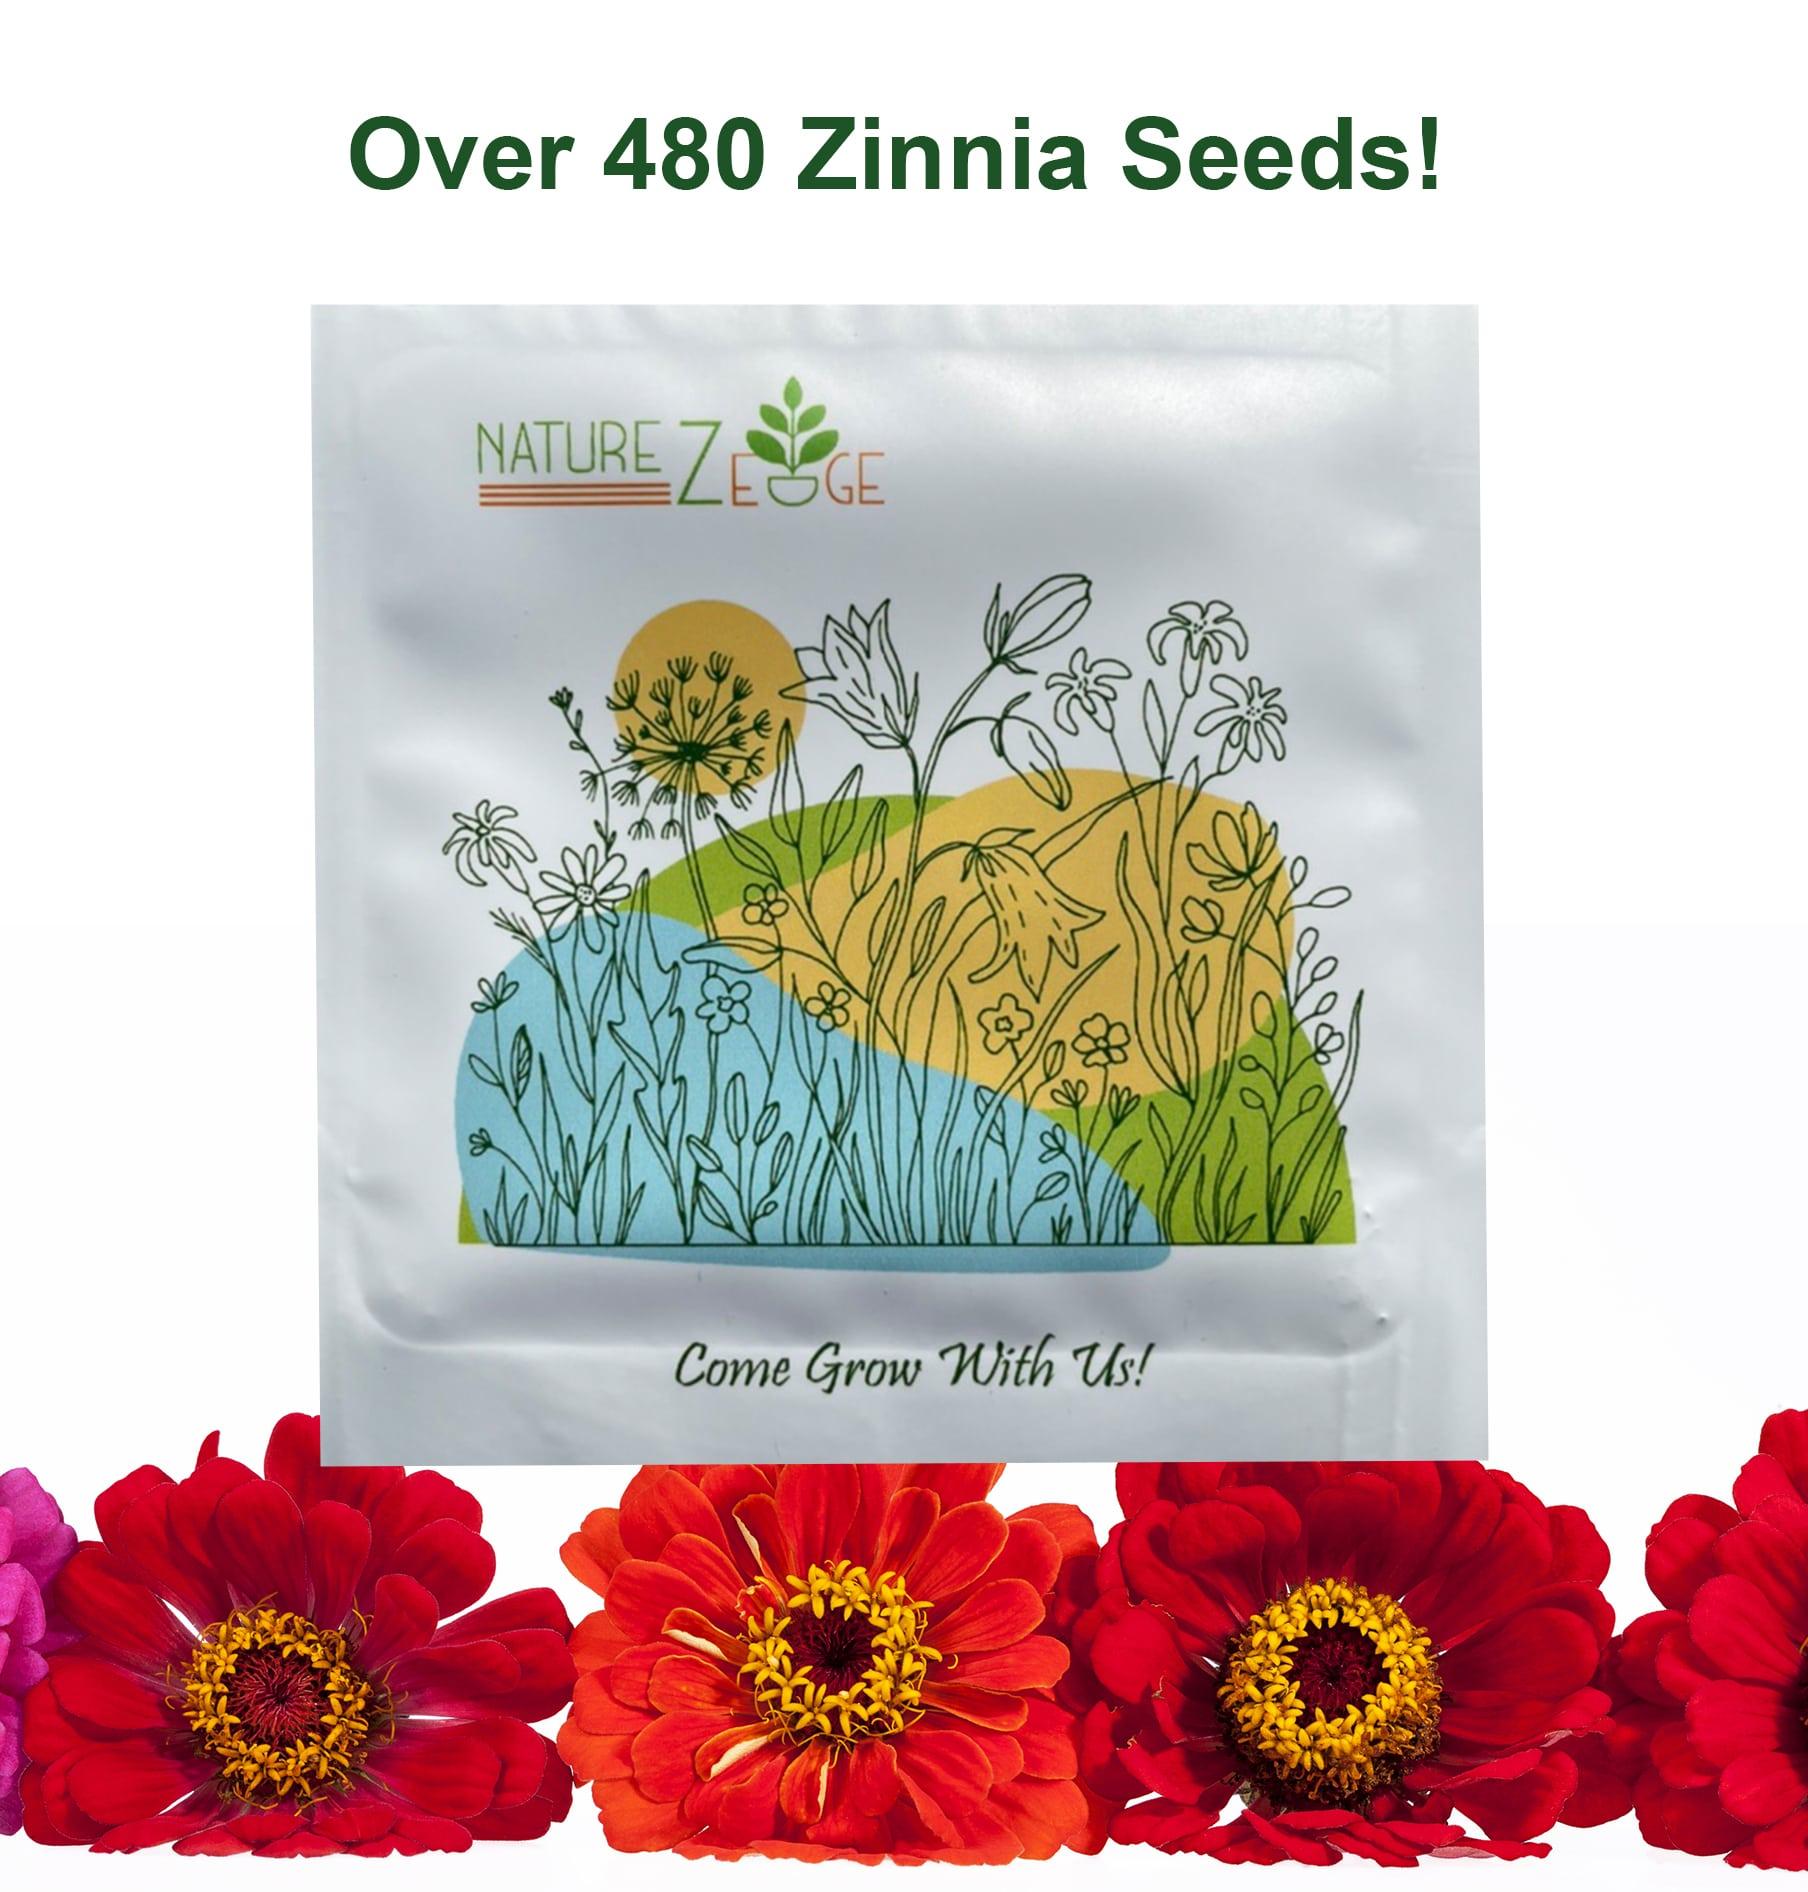 Zinnia Seeds for Planting Outdoors, 480 Seeds, Zinnia Elegans, 4.2 Grams